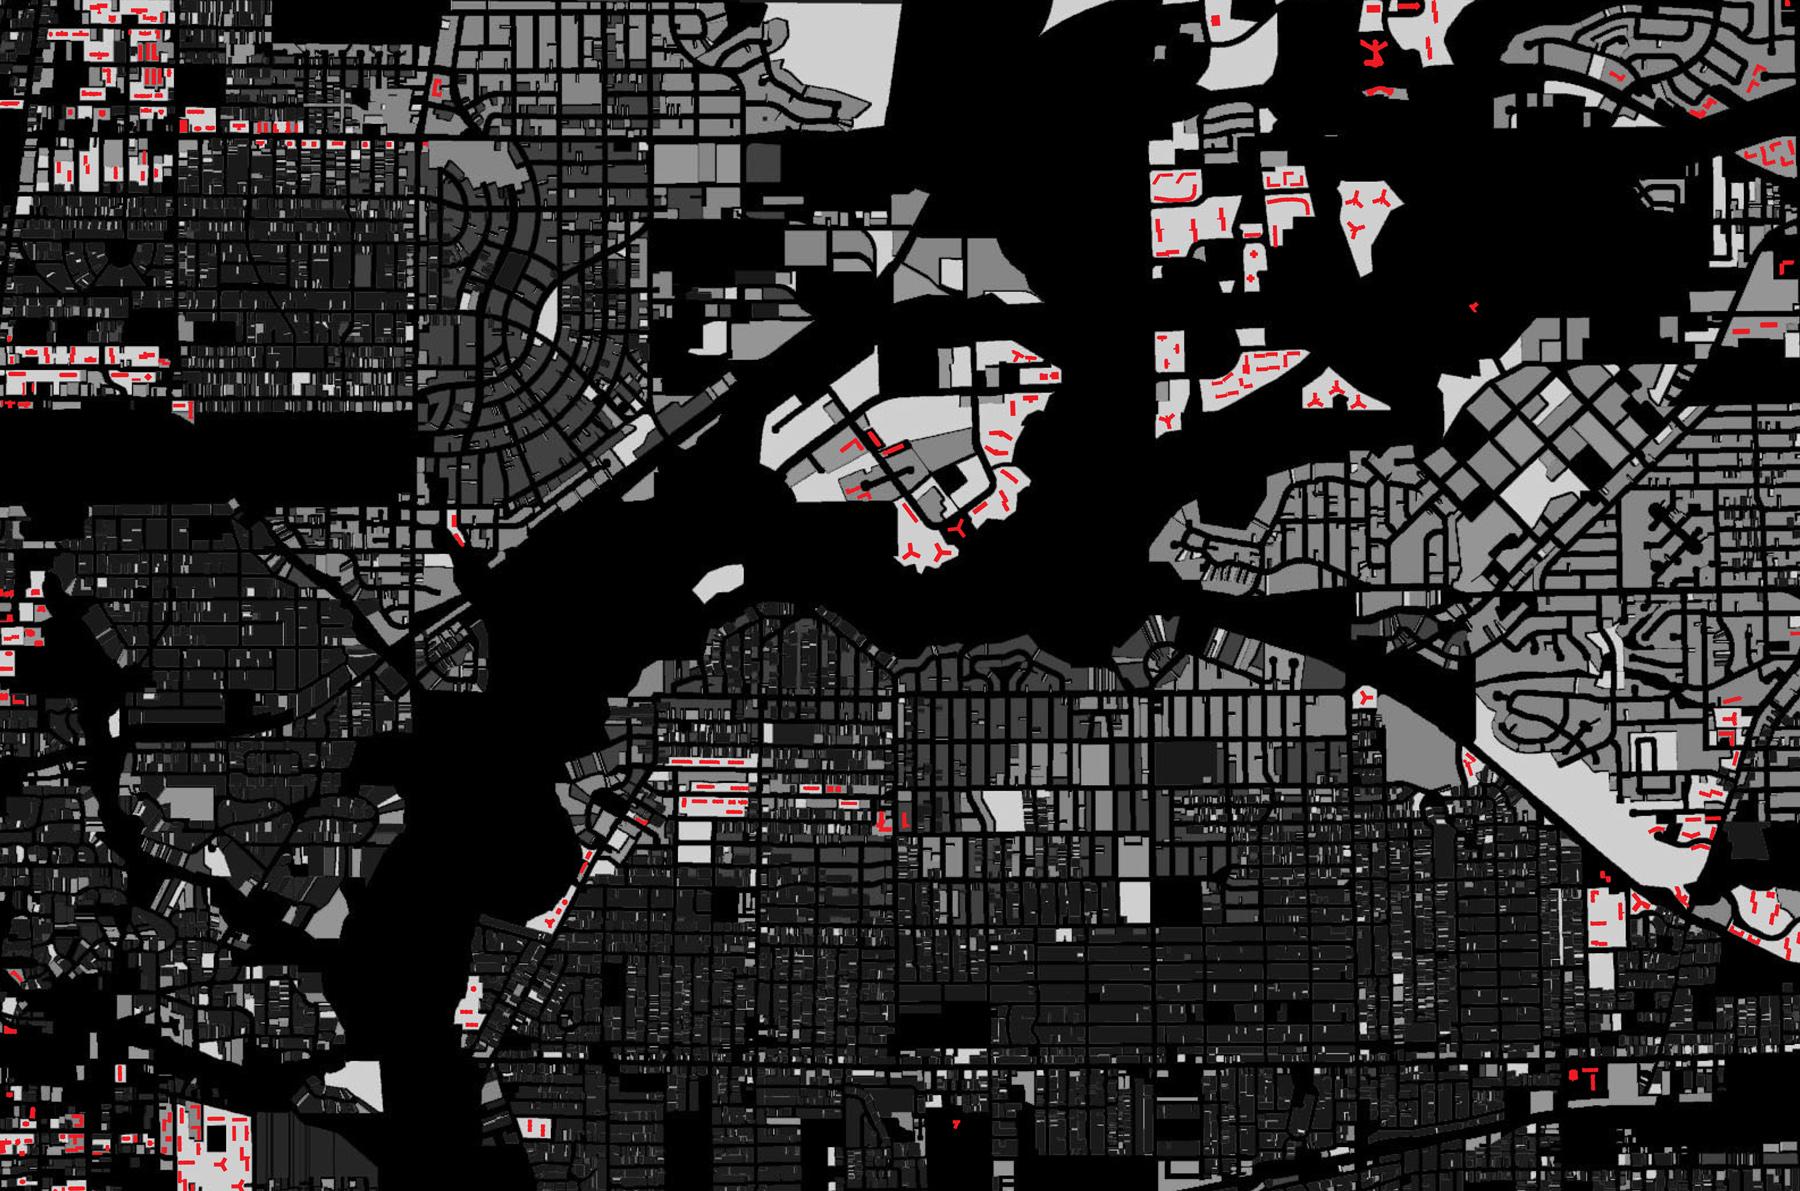 crop-development-map-2.jpg